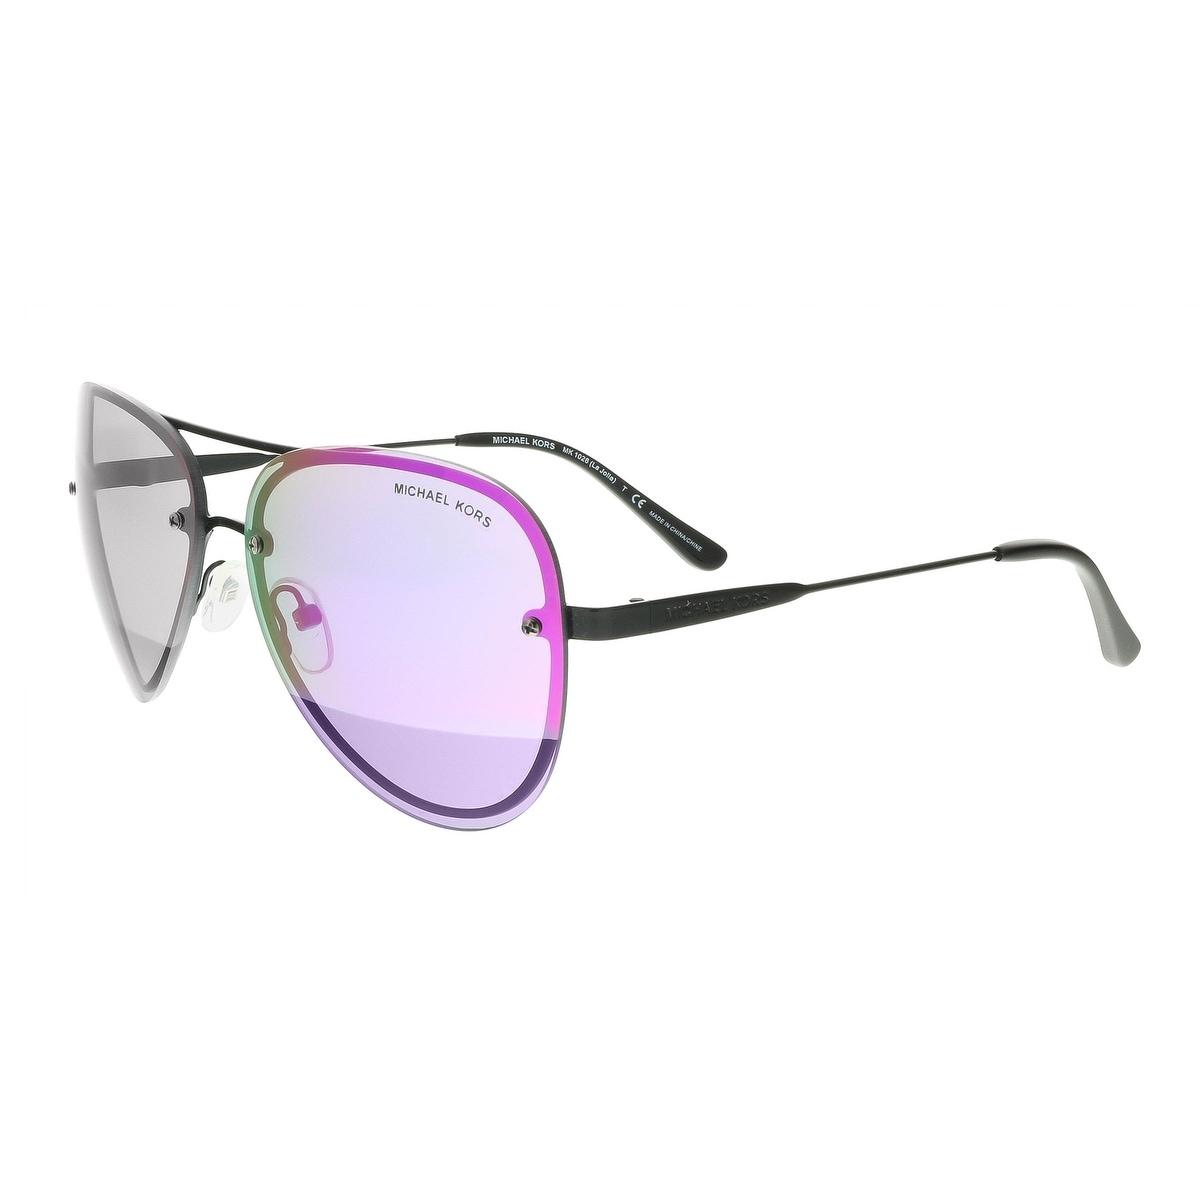 c557c6e80812f Michael Kors Sunglasses